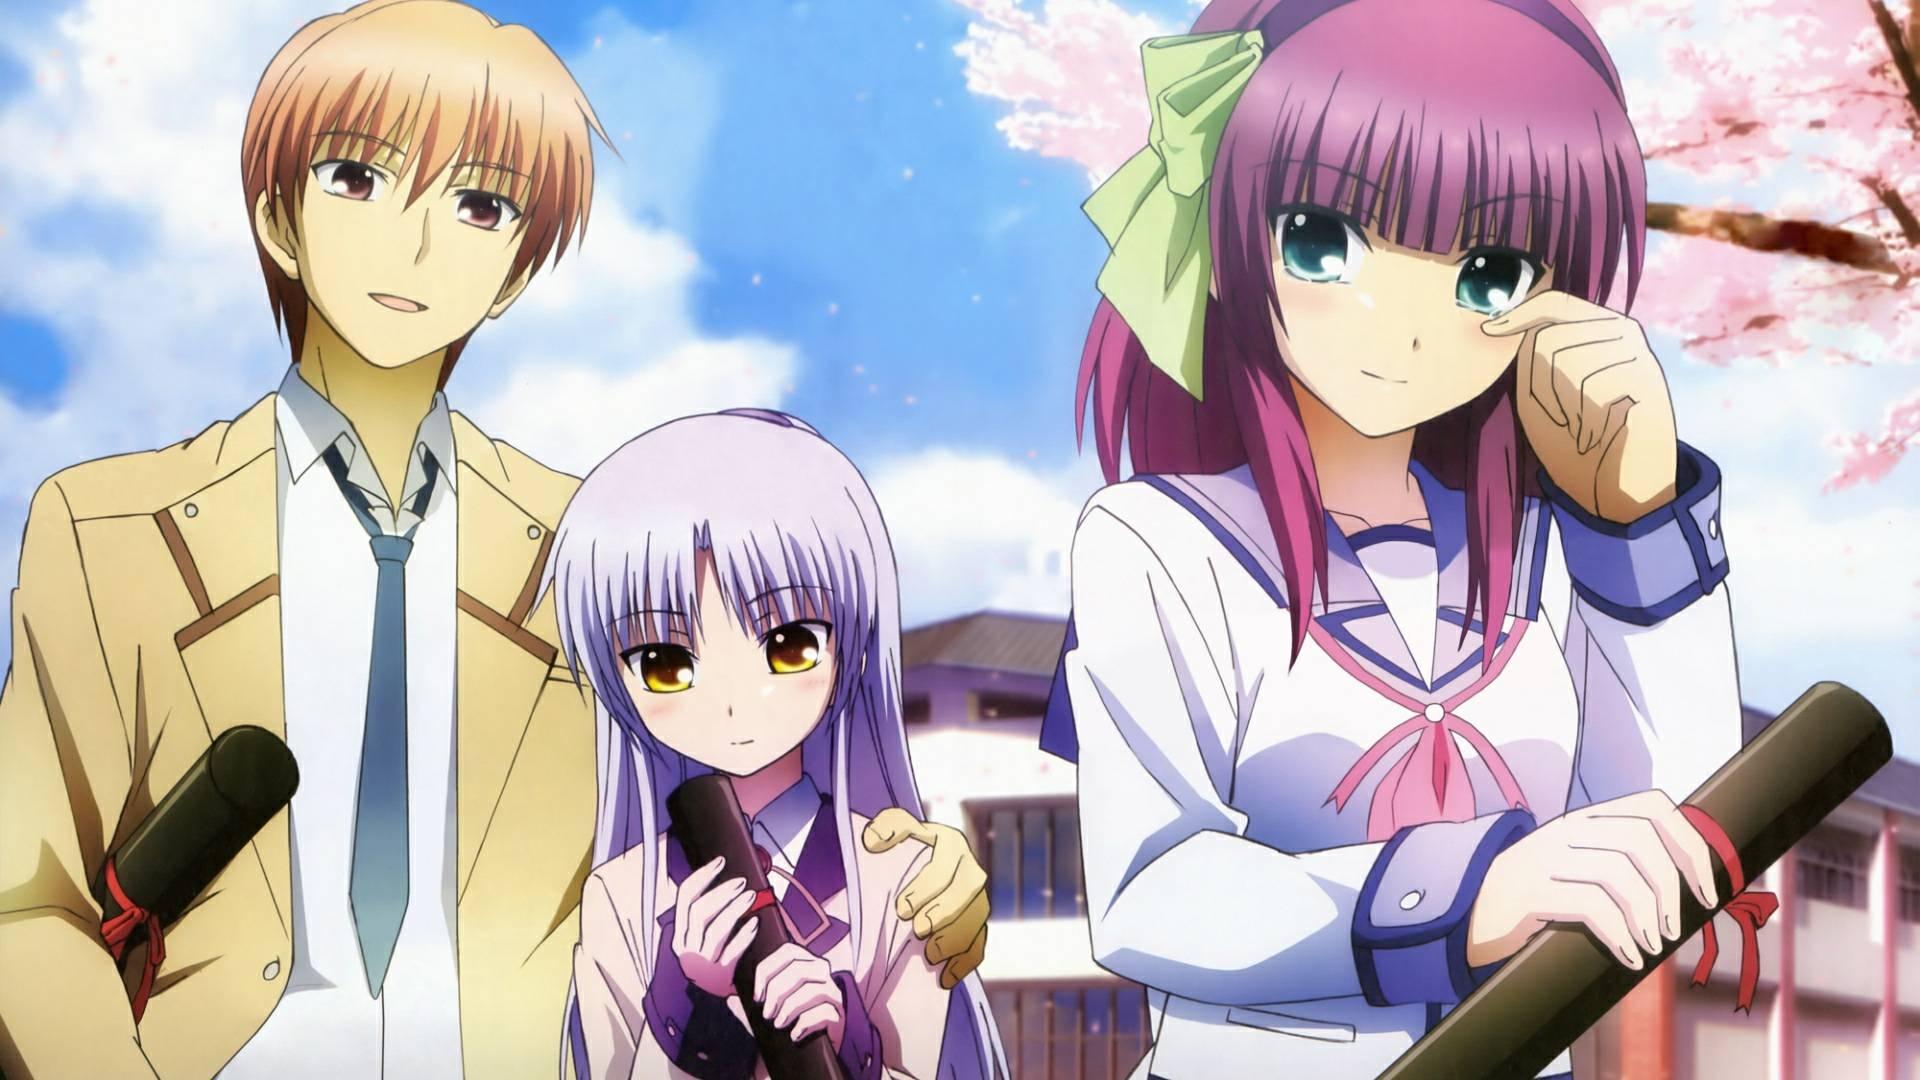 angel beats! kanade tachibana yuri nakamura and otonashi yuzuru